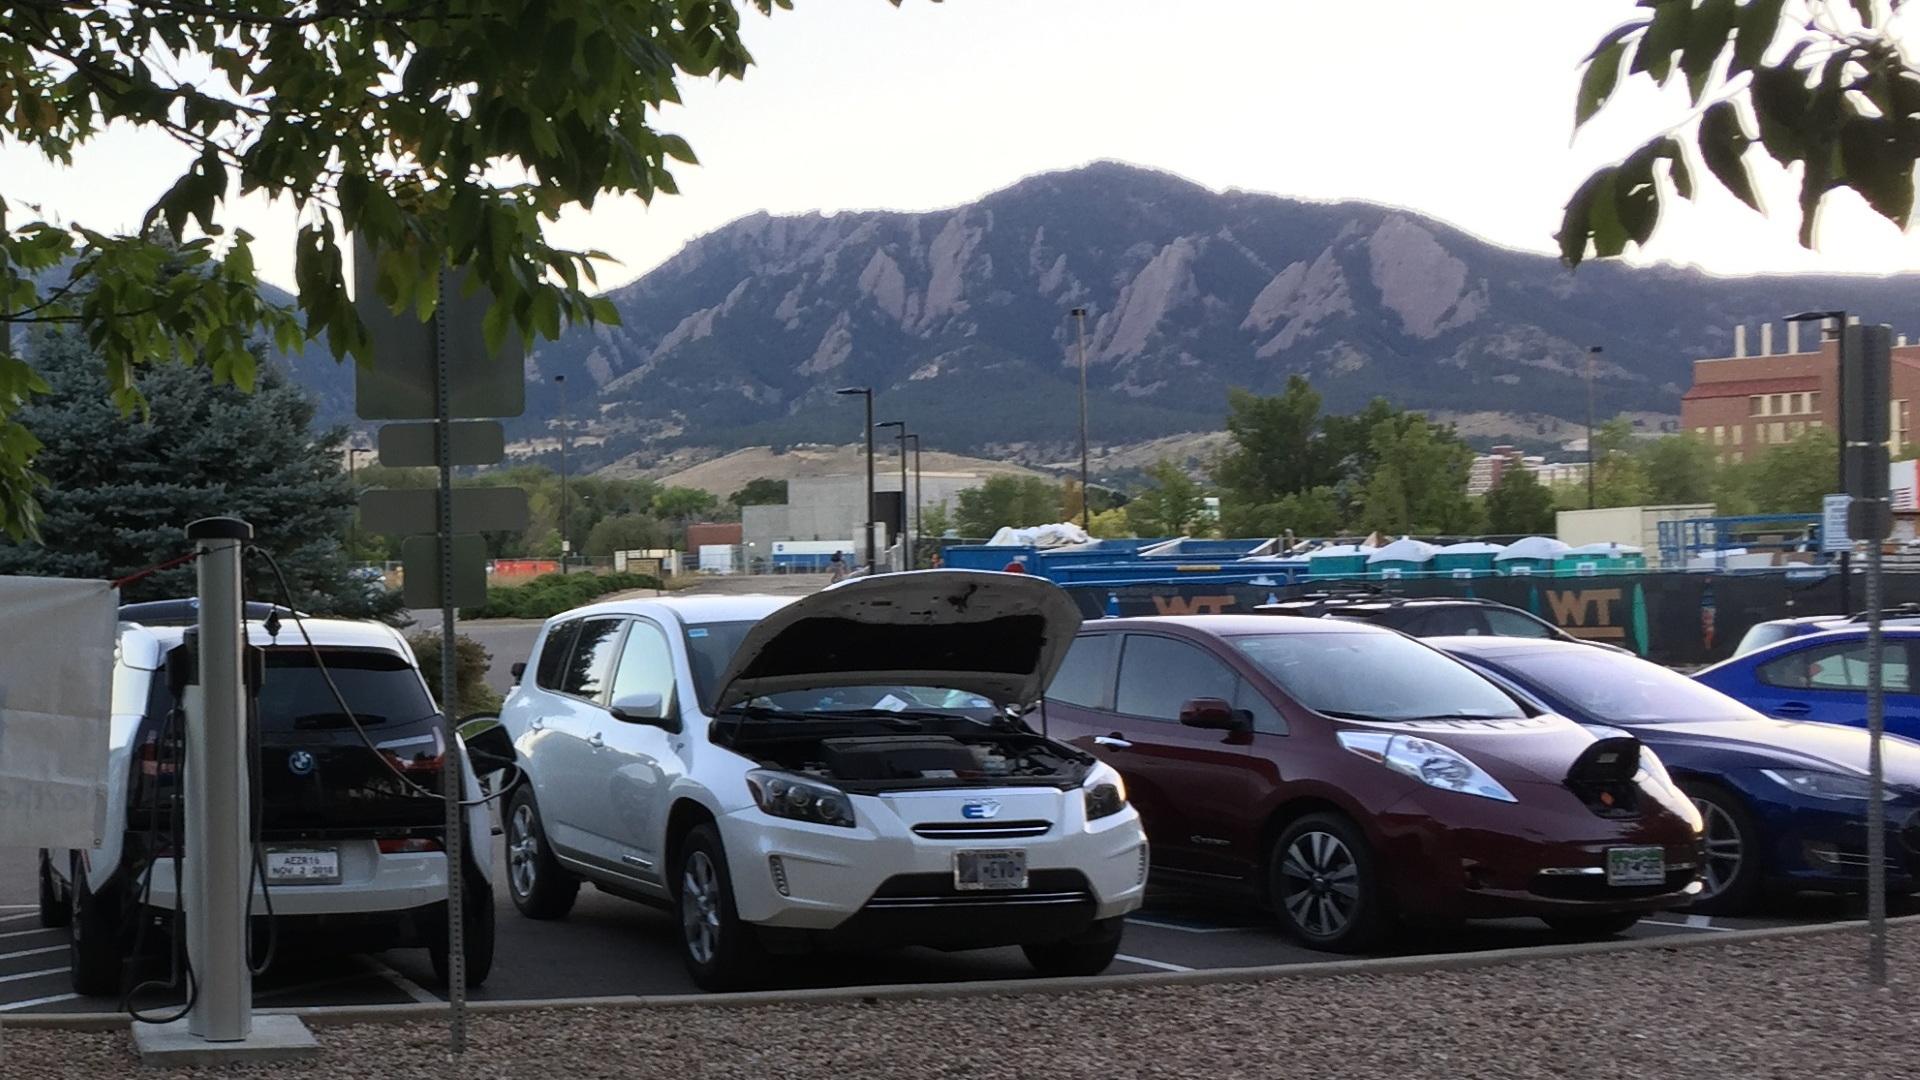 National Drive Electric Week 2018, Boulder, Colorado [CREDIT: NDEW, Diego Lopez]